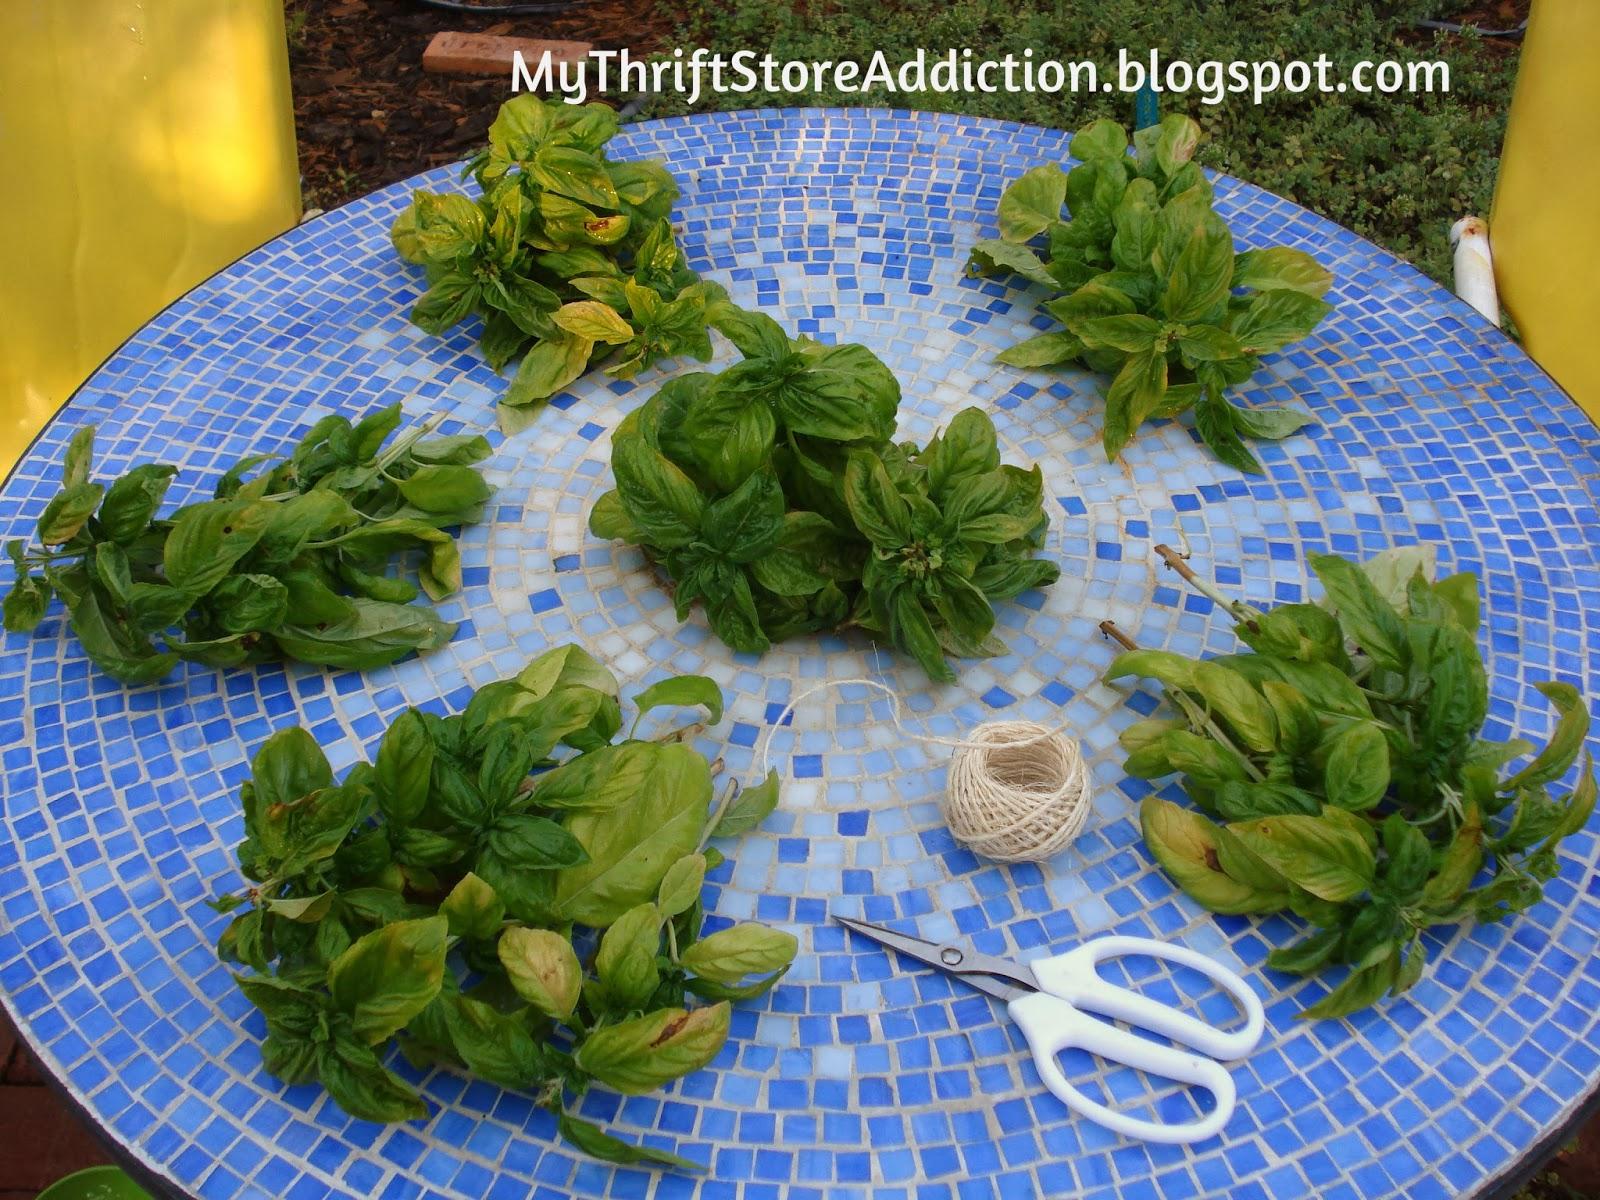 drying organic herbs